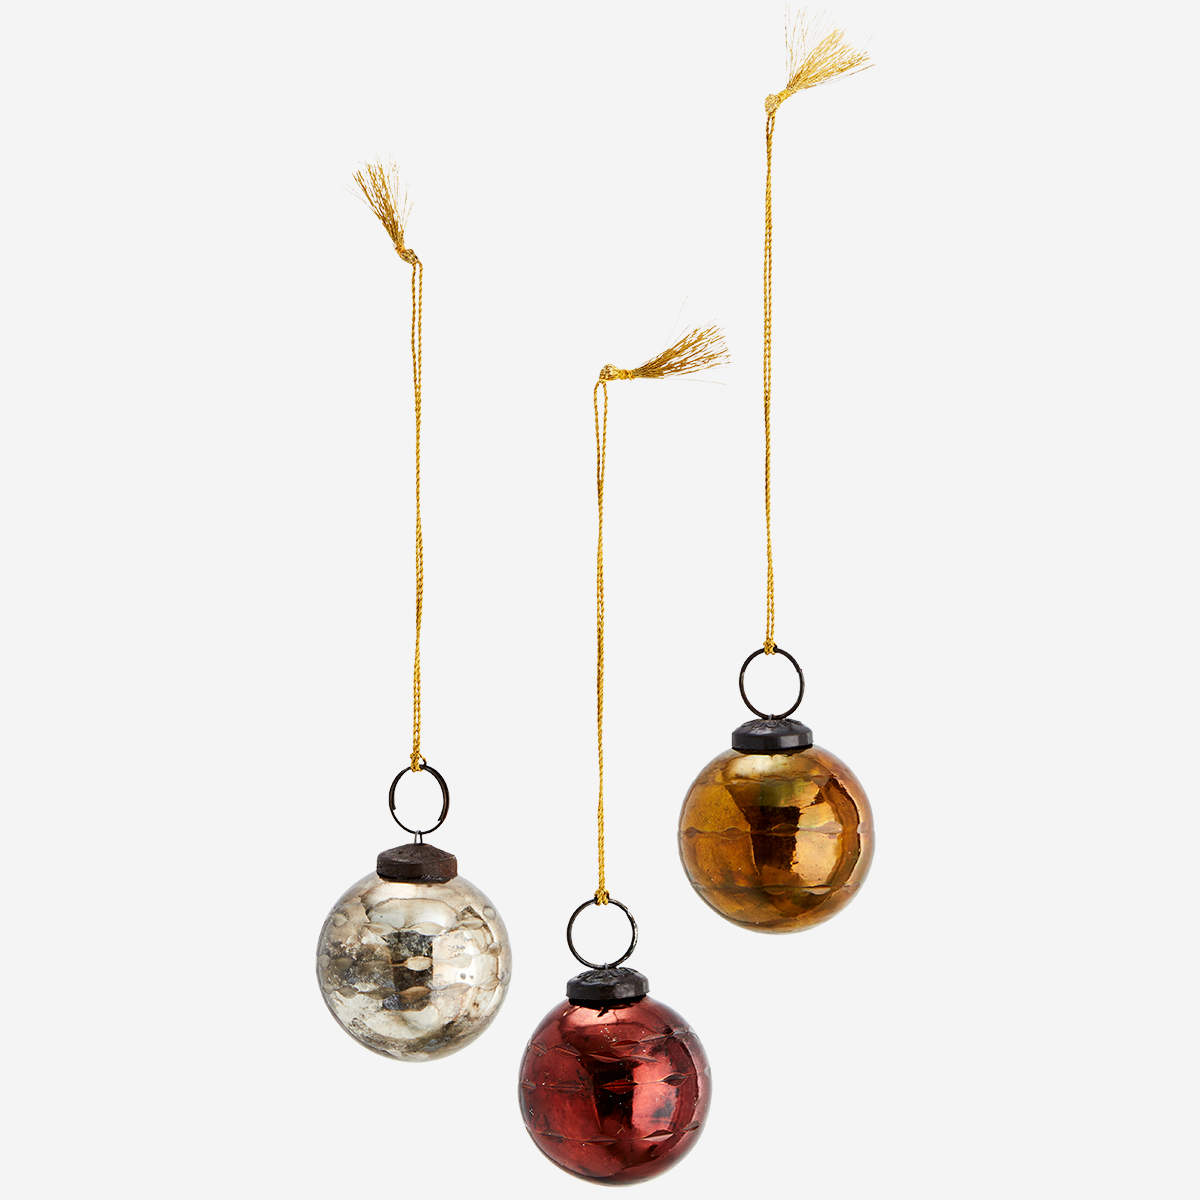 Hanging Glass Balls